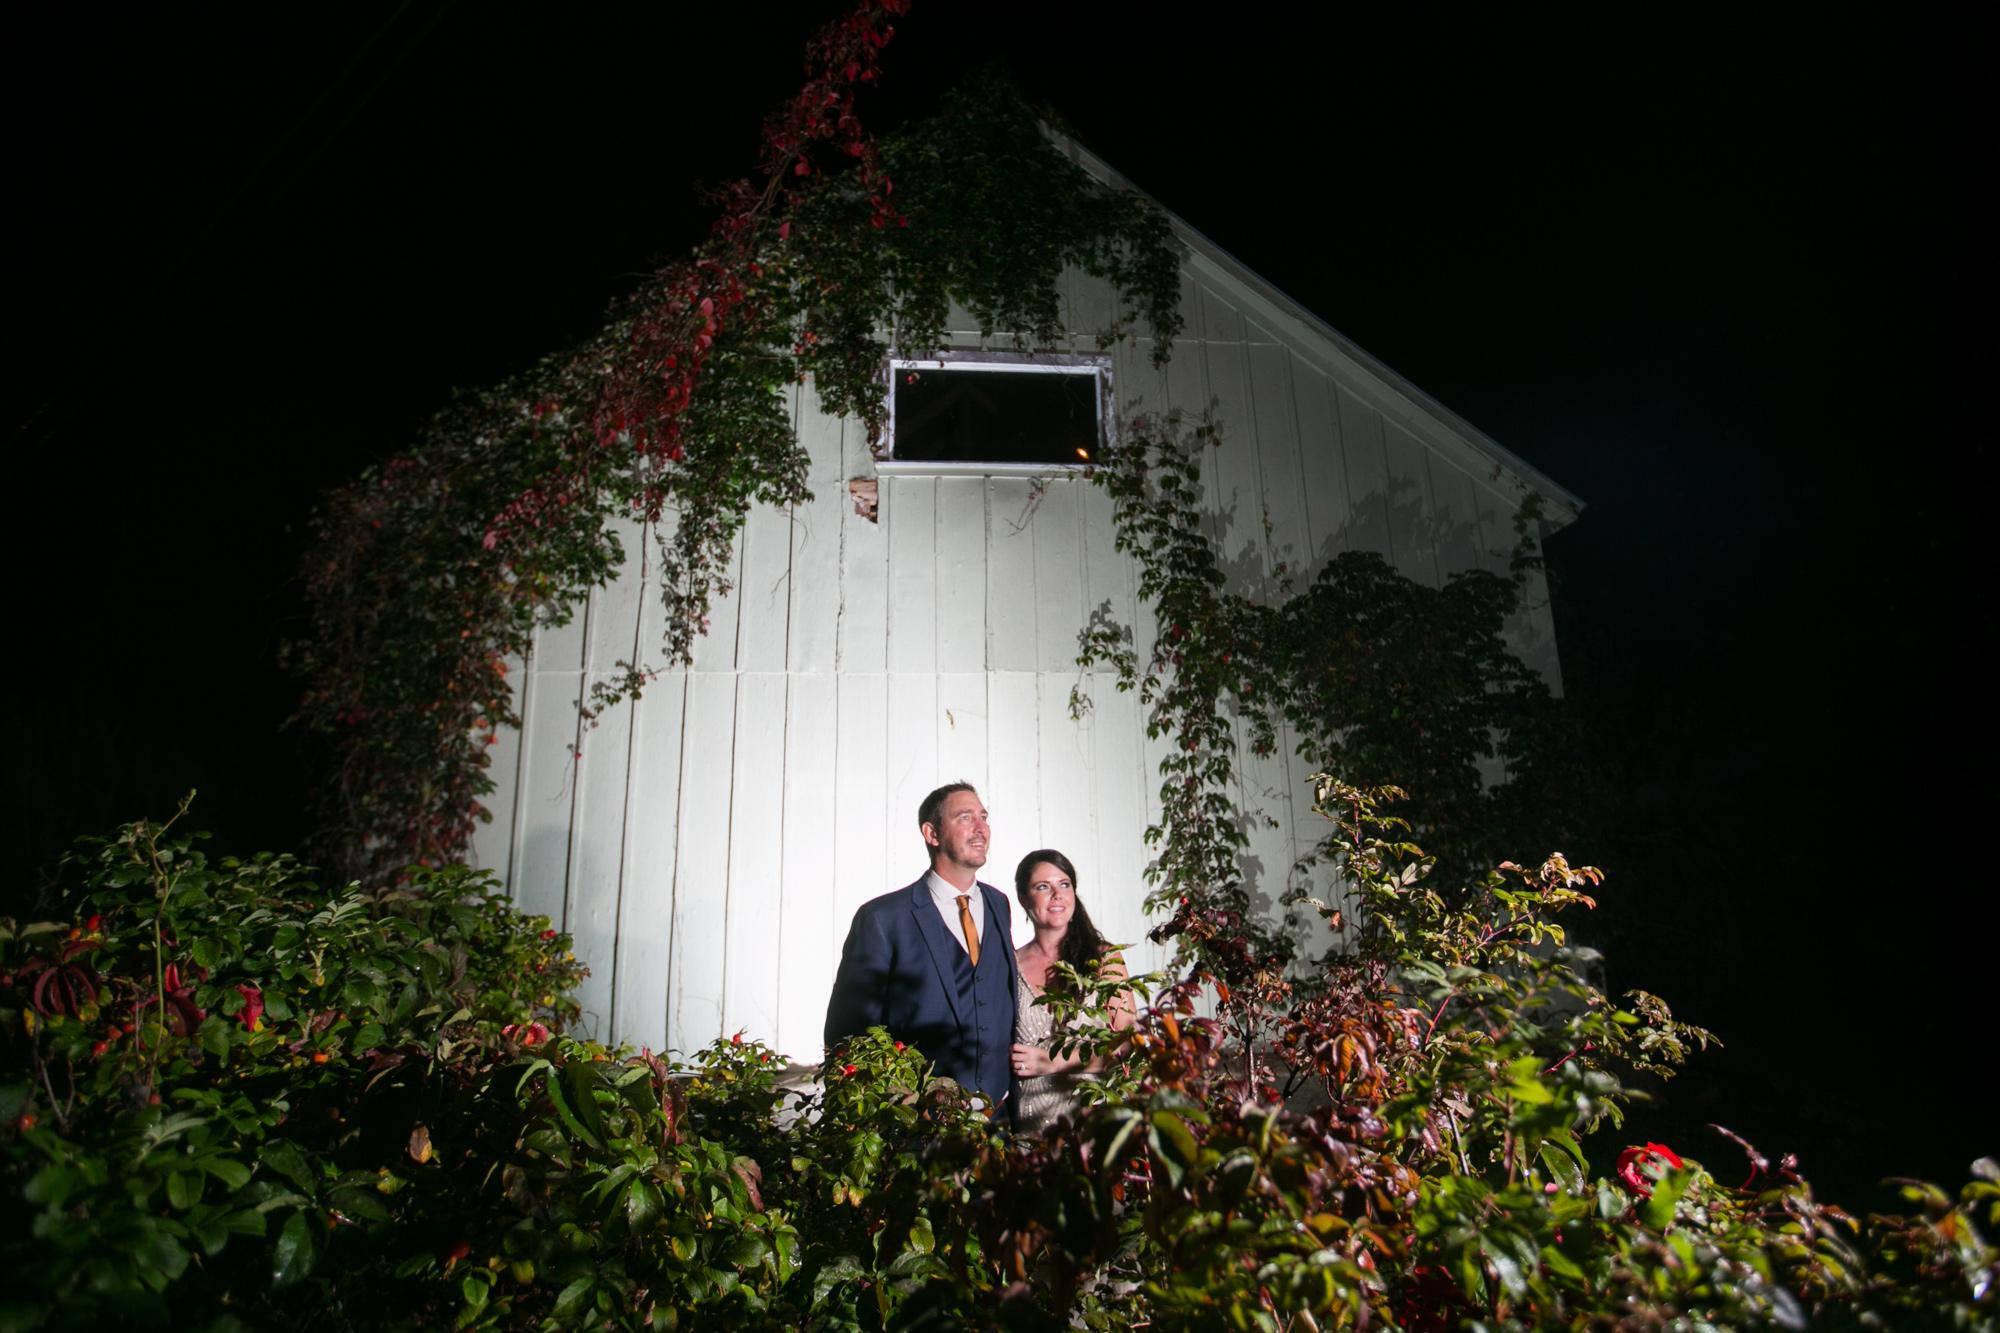 402-atlantica-oak-island-wedding.jpg